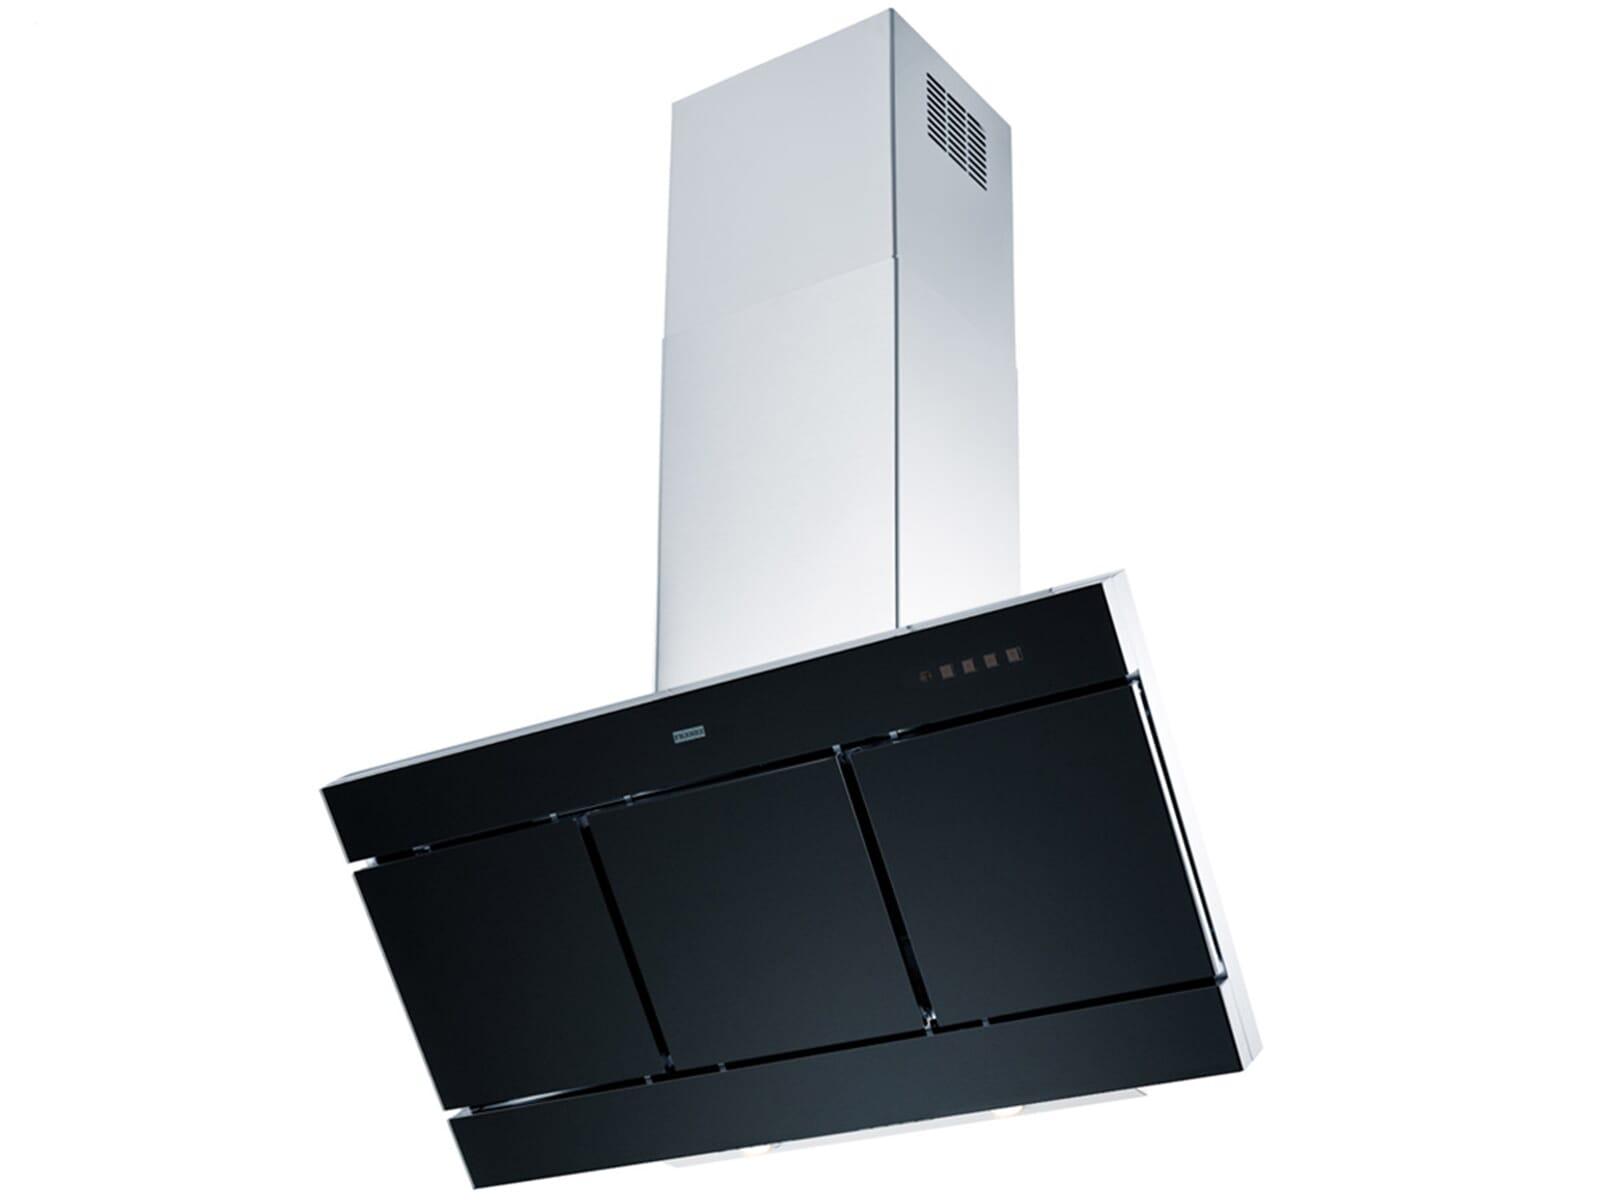 franke mythos glass fmyg 915 bk xs kopffrei wand dunstabzugshaube schwarz 90cm ebay. Black Bedroom Furniture Sets. Home Design Ideas